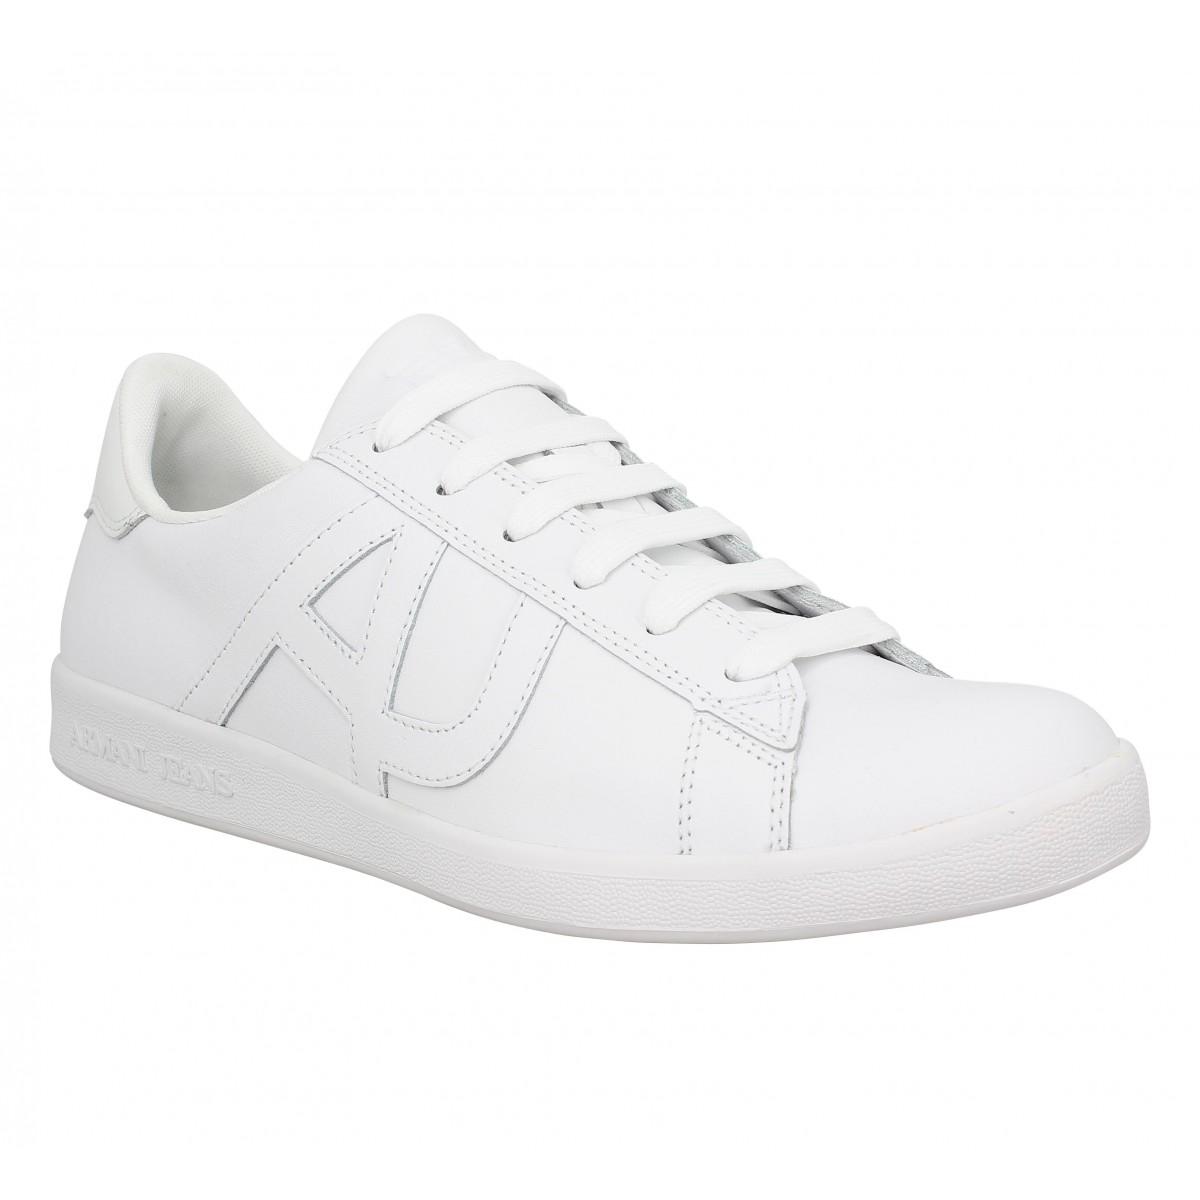 Baskets ARMANI JEANS 6565 cuir Homme Blanc